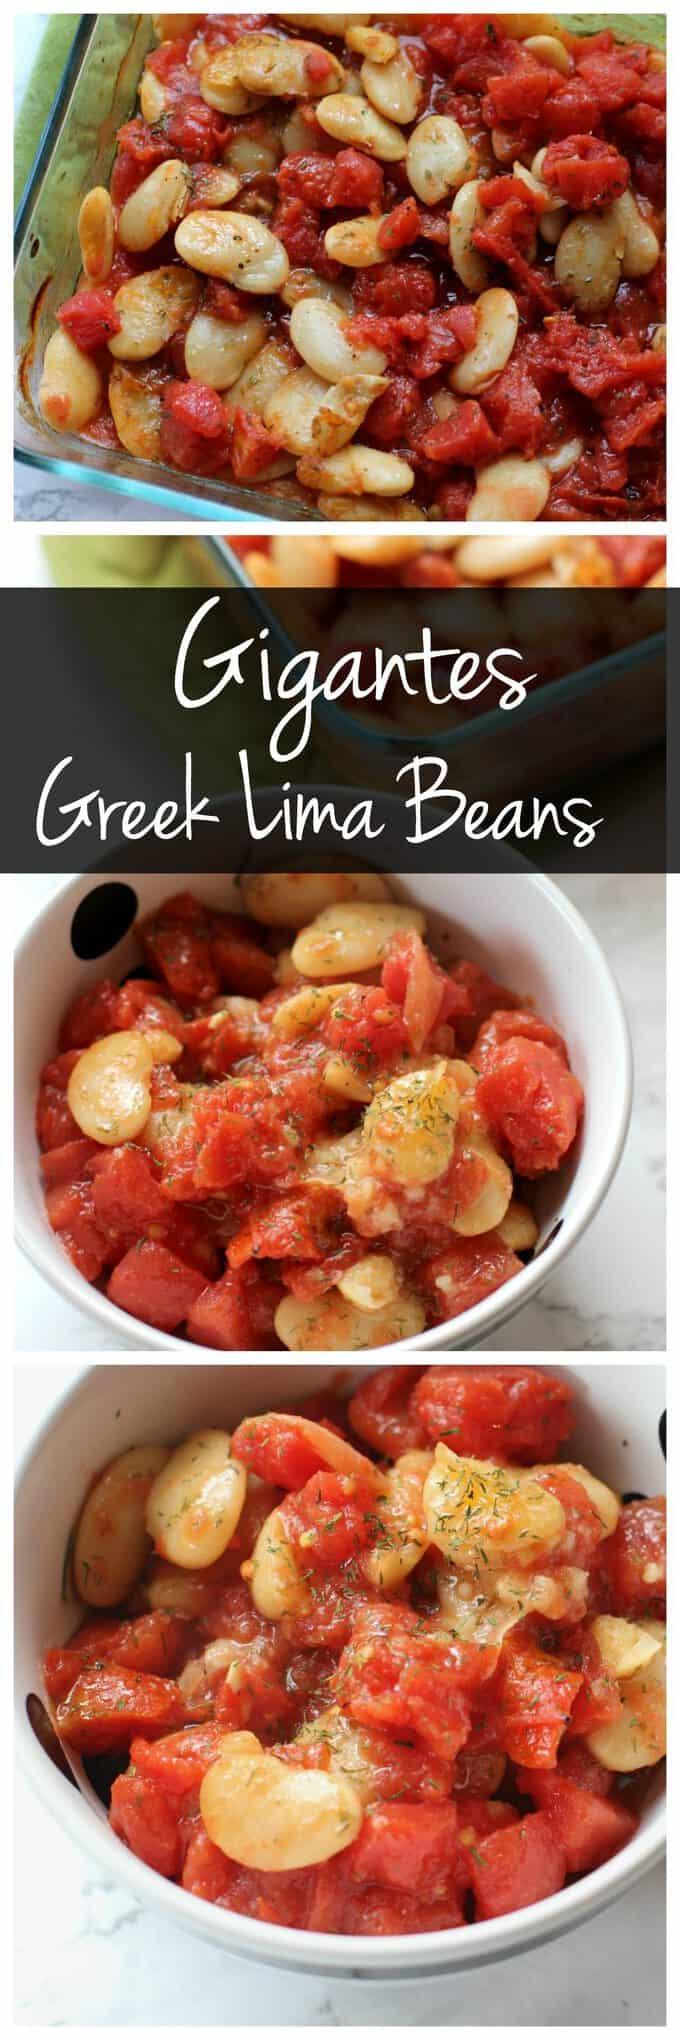 Easy Baked Gigantes (Giant Greek Lima Beans)